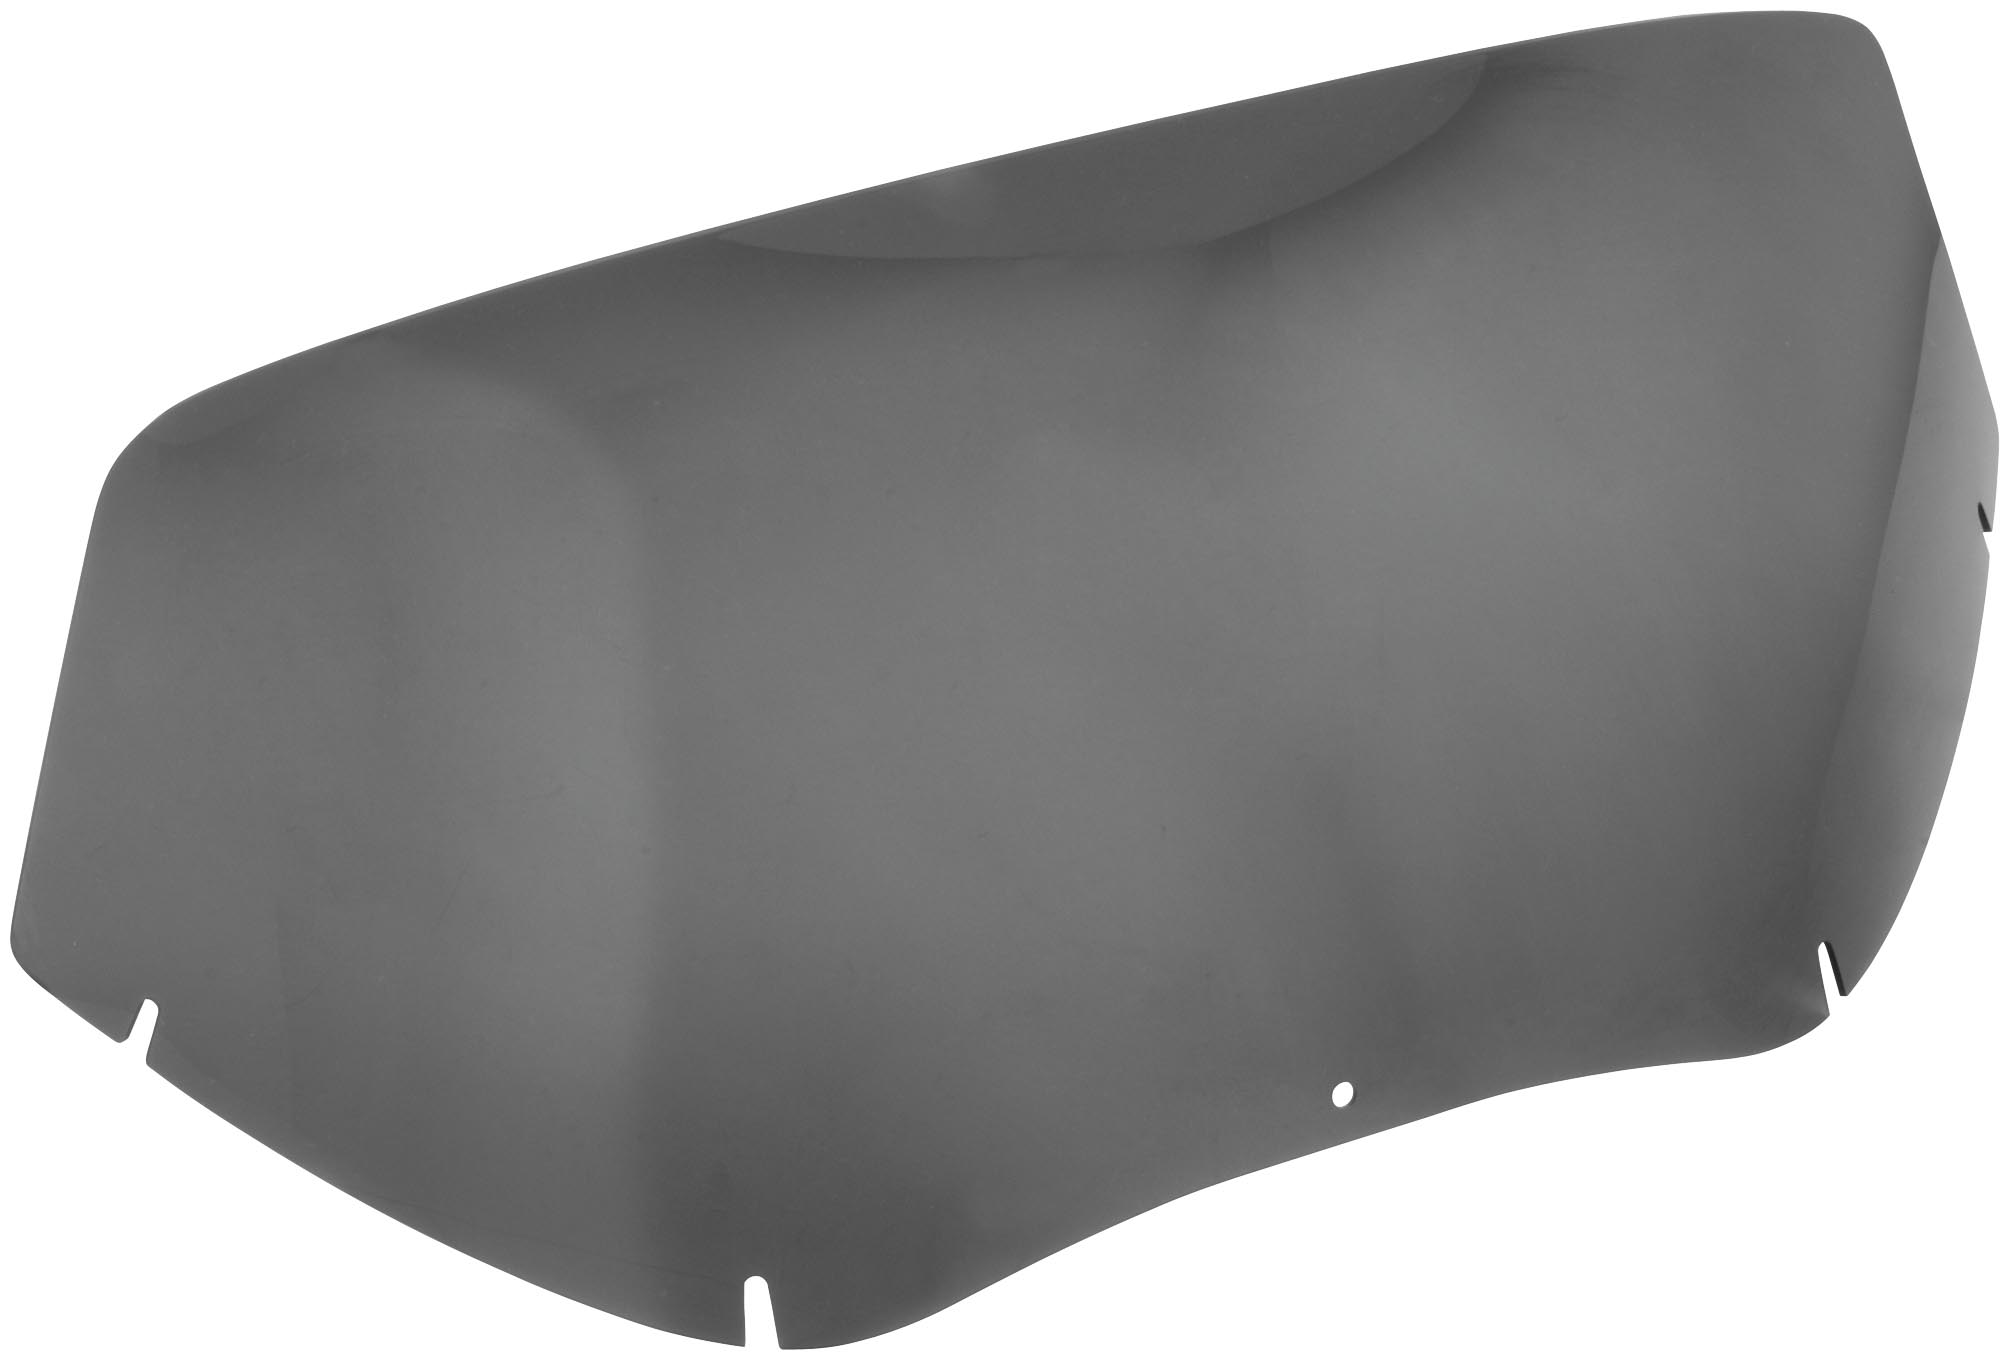 Wind Vest Replacement Screen